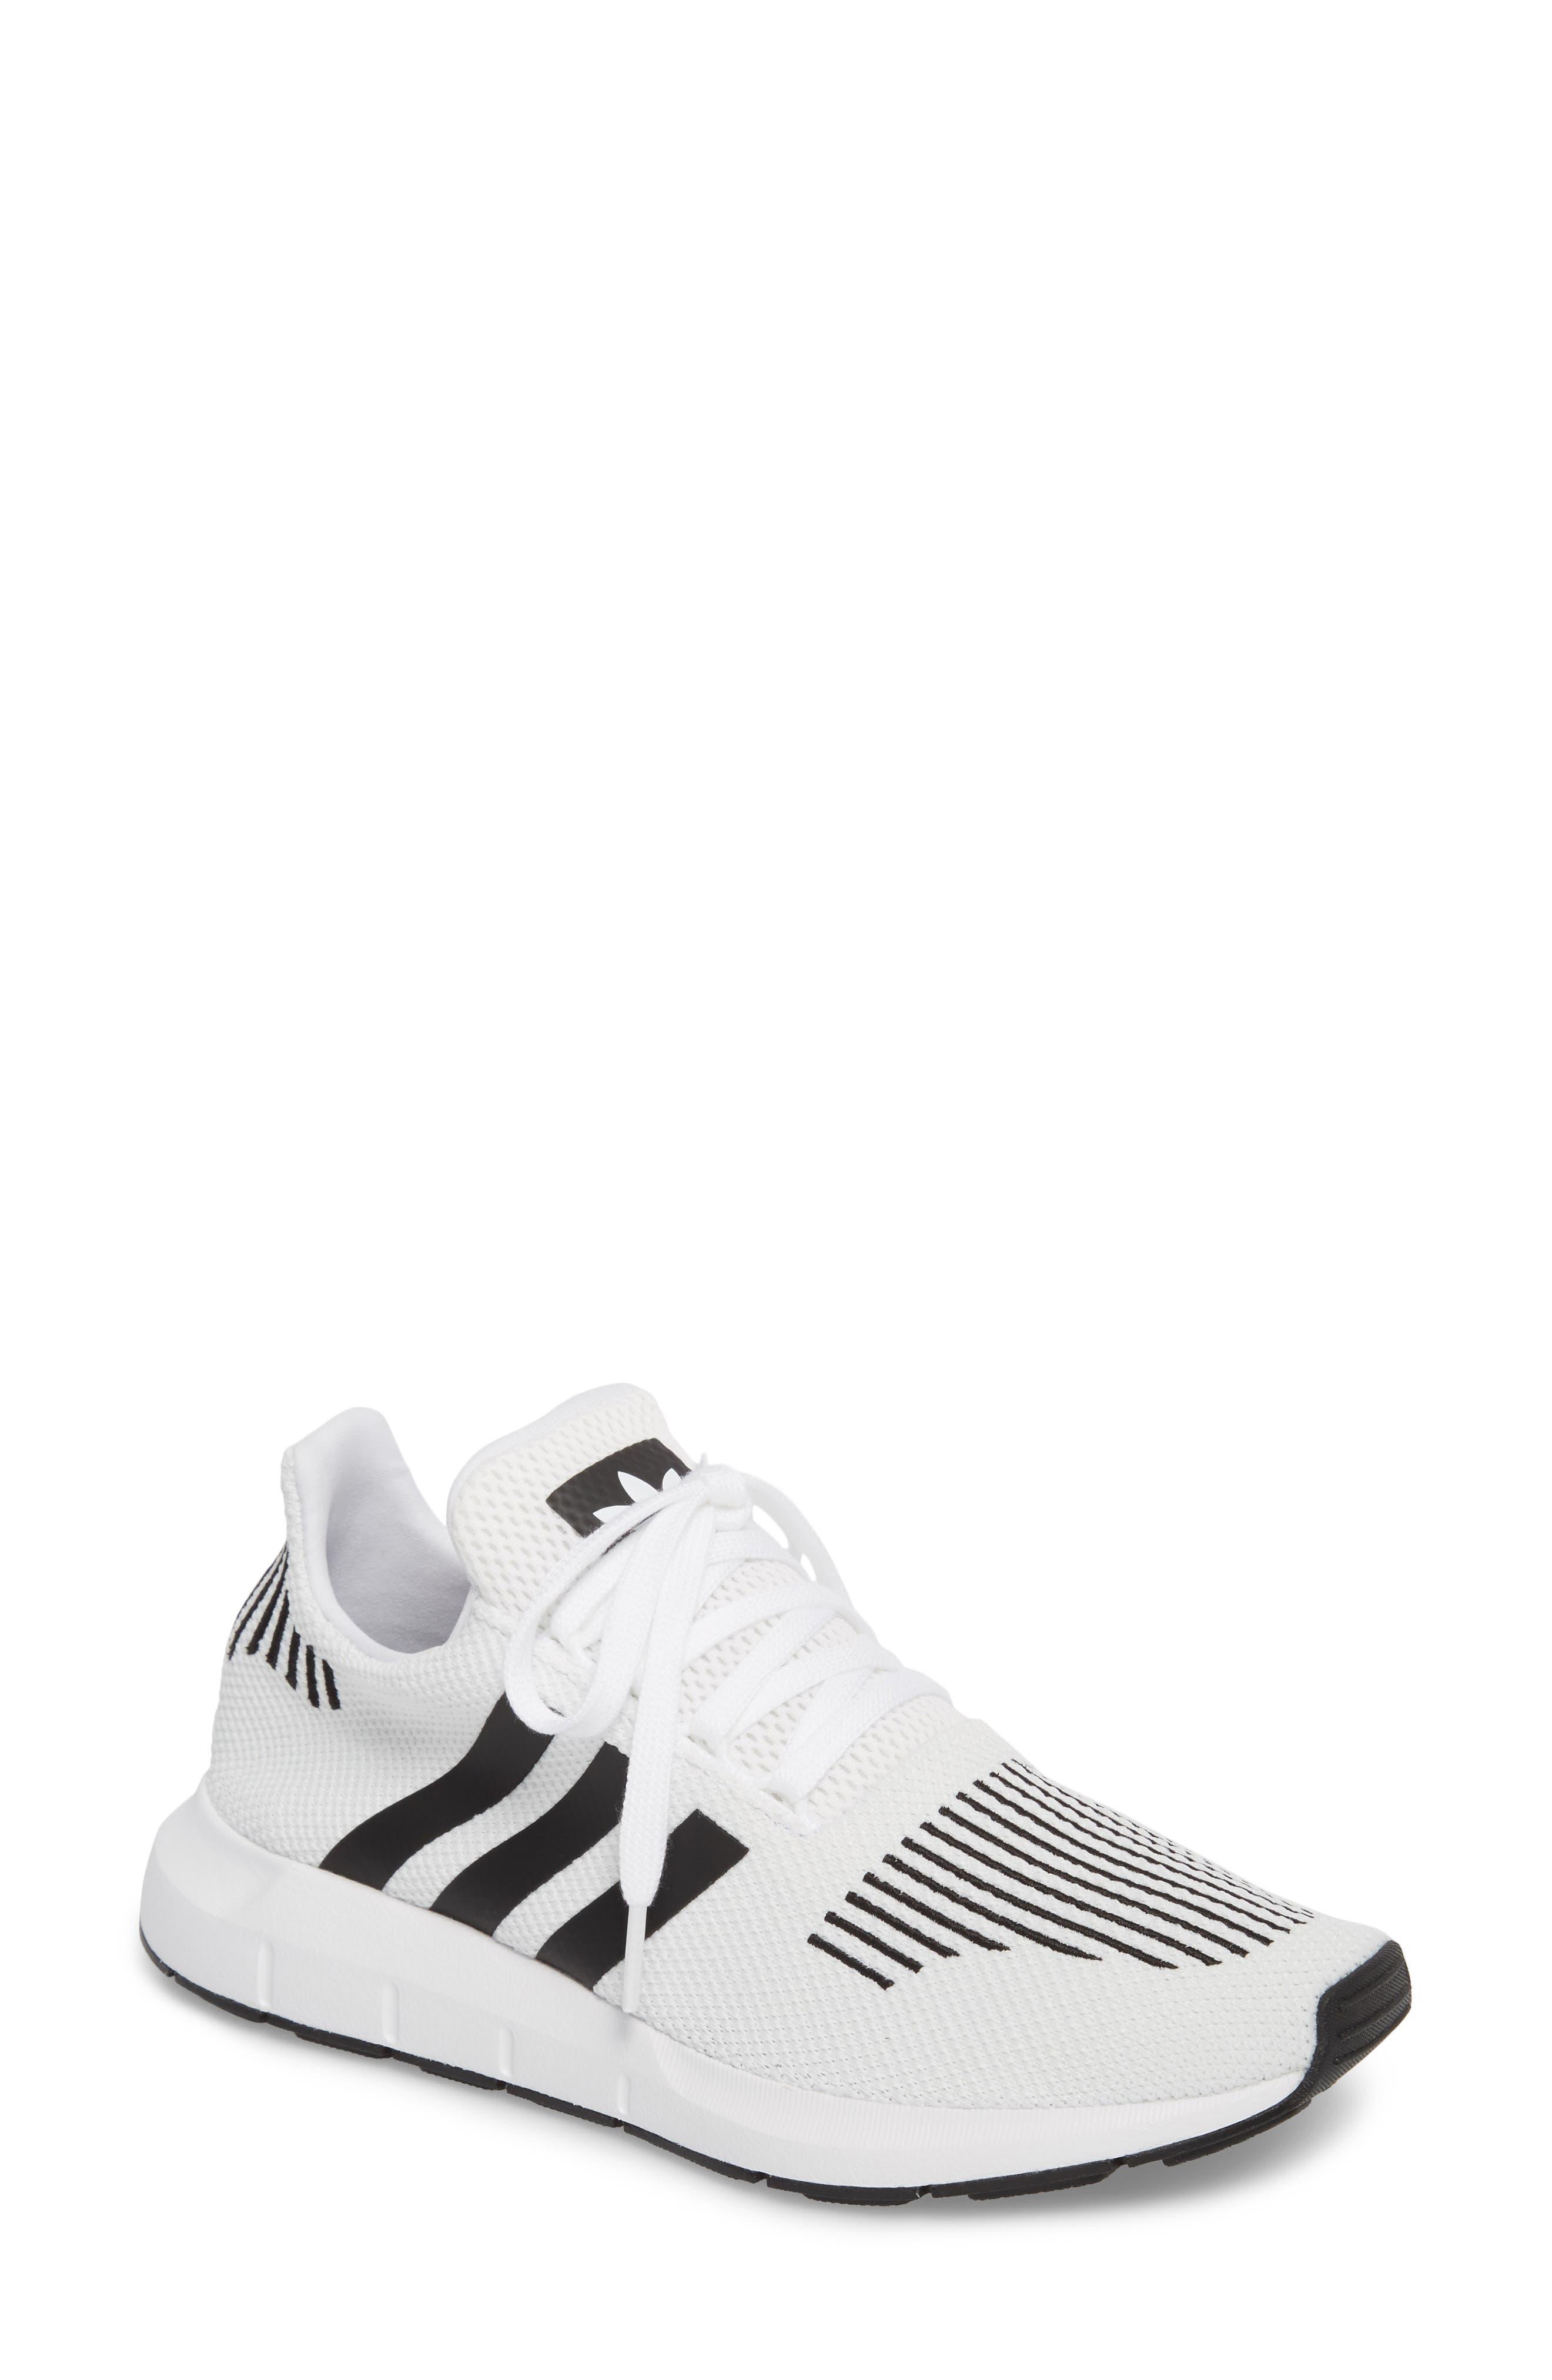 Alternate Image 1 Selected - adidas Swift Run Sneaker (Women)